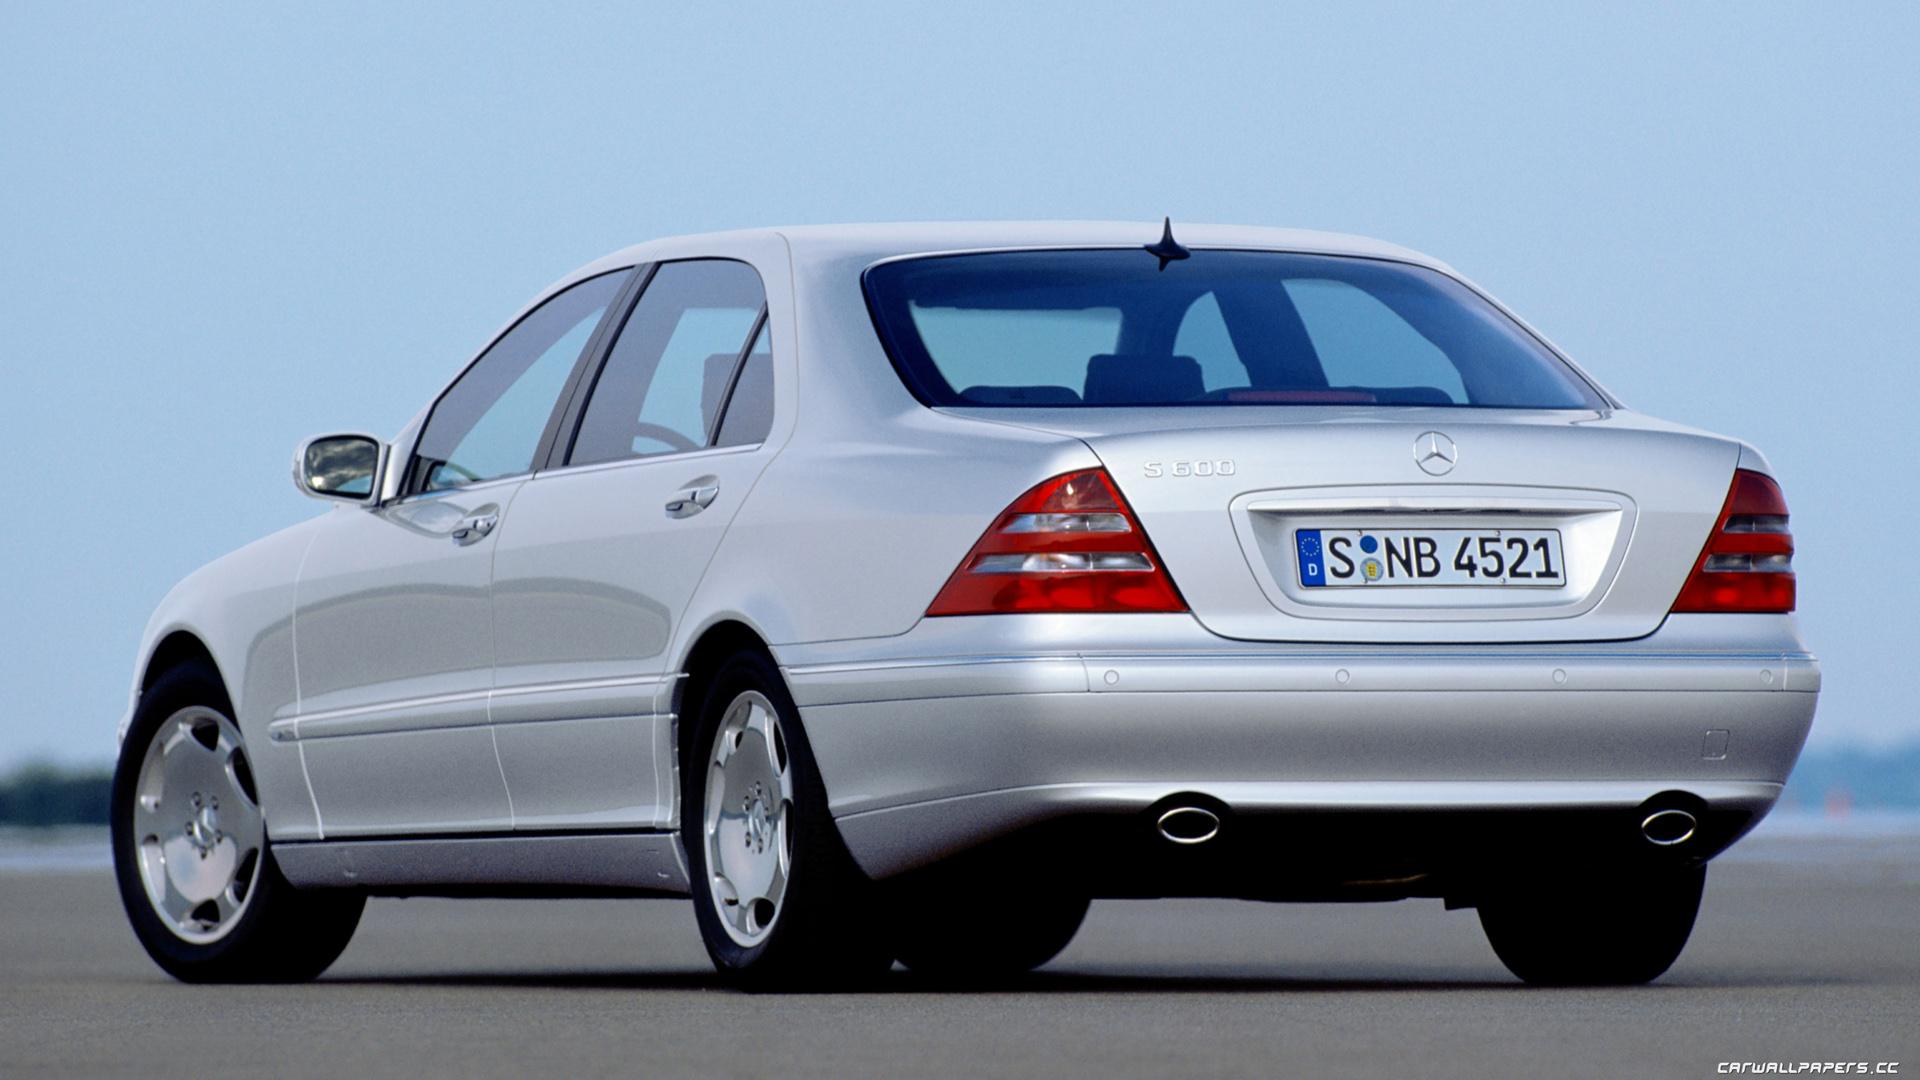 Cars desktop wallpapers Mercedes-Benz S600 W220 - 1999